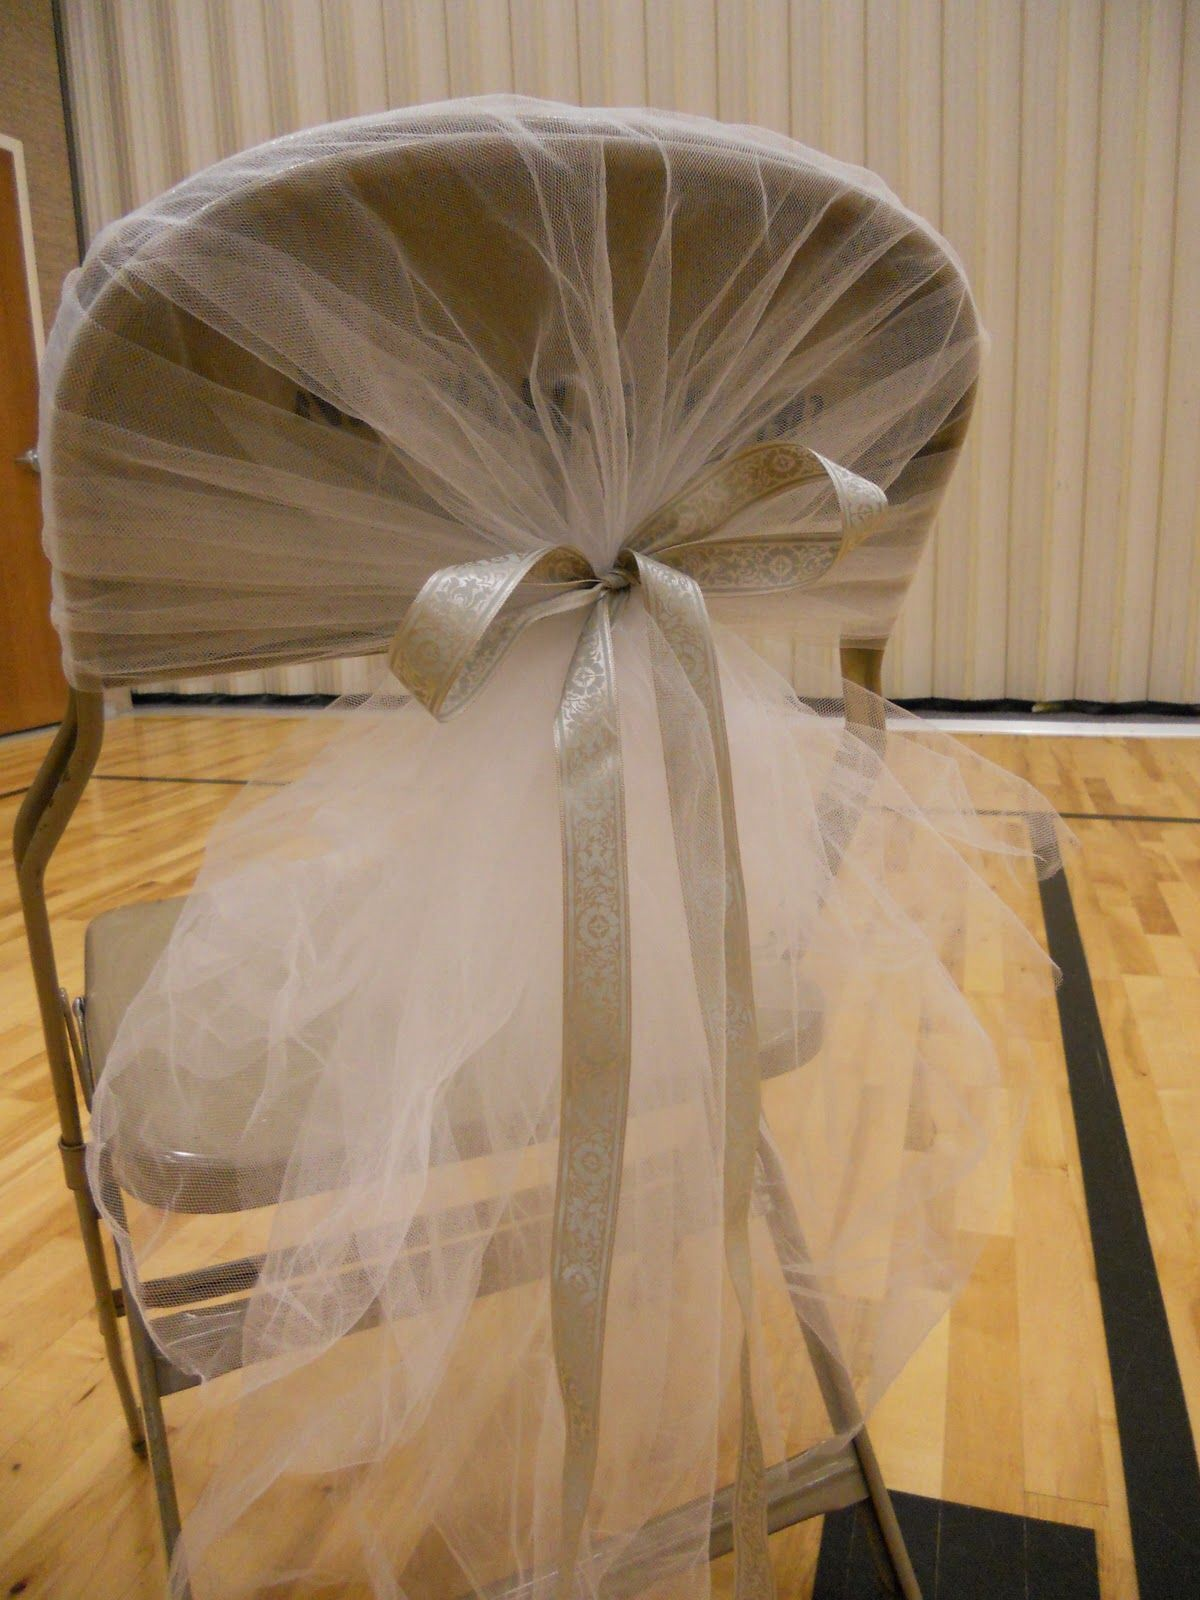 Wedding decorations using tulle  Char idea  WeddingsIdeas Of All Kinds  Pinterest  Wedding